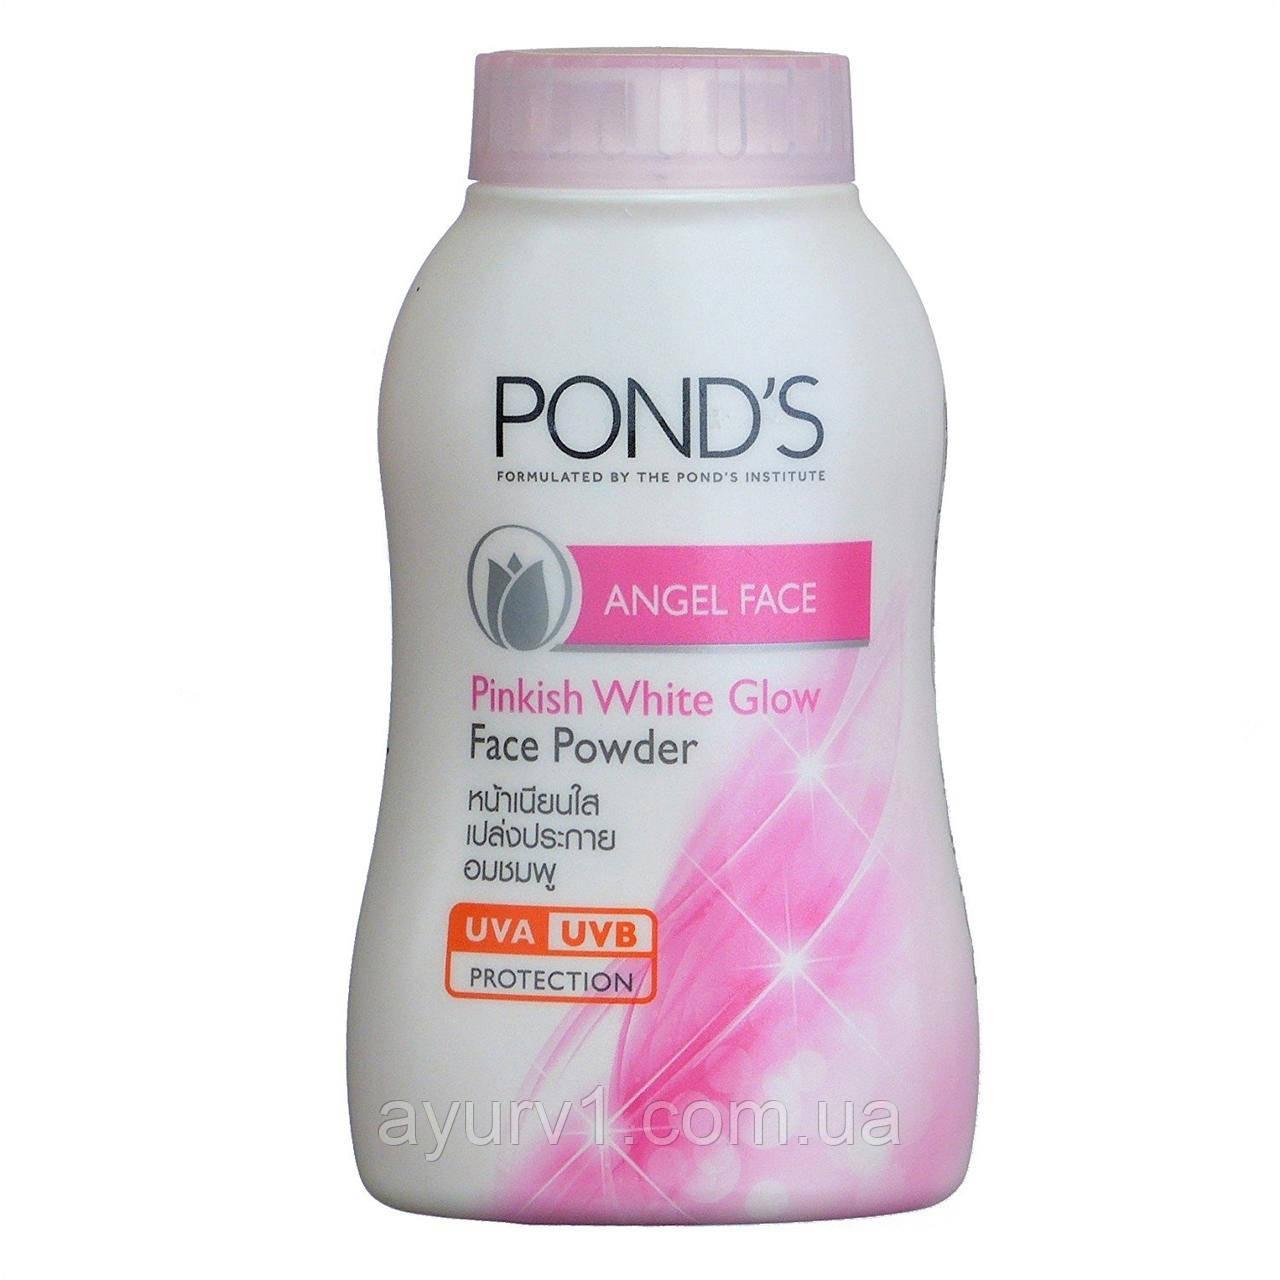 Ponds Angel Face Pinkish White Glow  матирующая пудра-тальк для лица и тела с SPF защитой